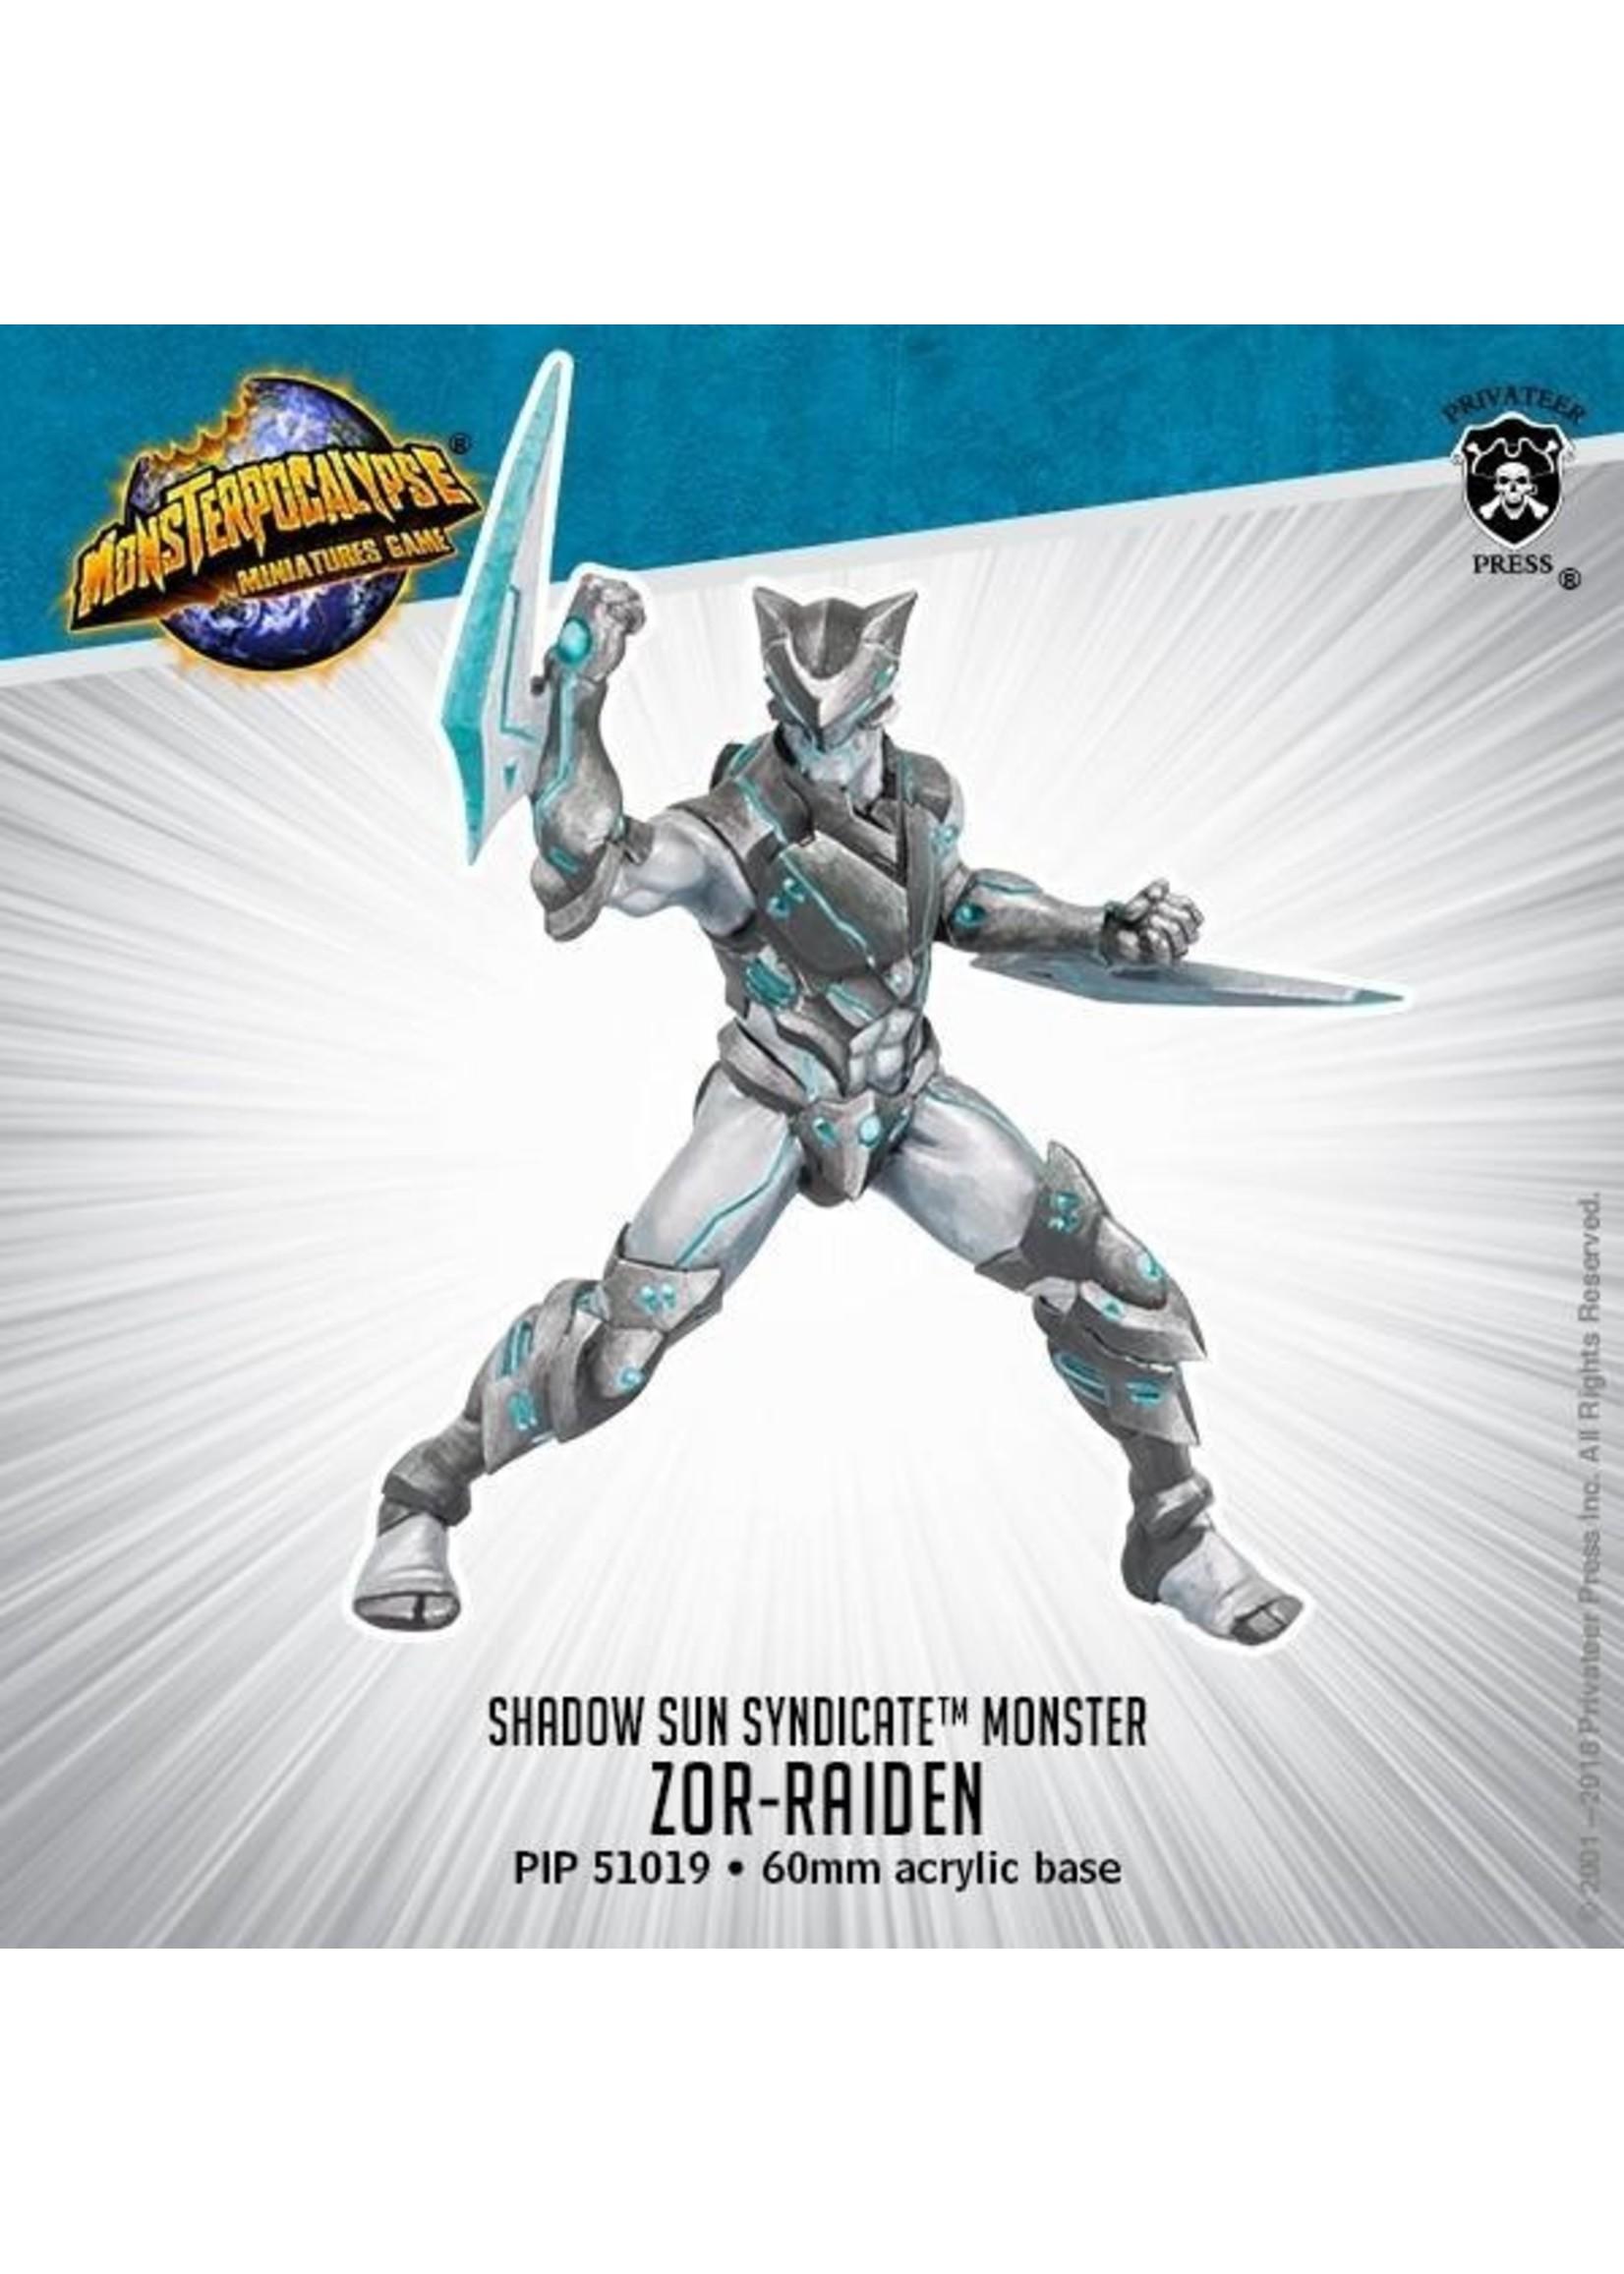 Monsterpocalypse: Shadow Sun Syndicate Zor-Raiden Monster (Resin and White Metal)